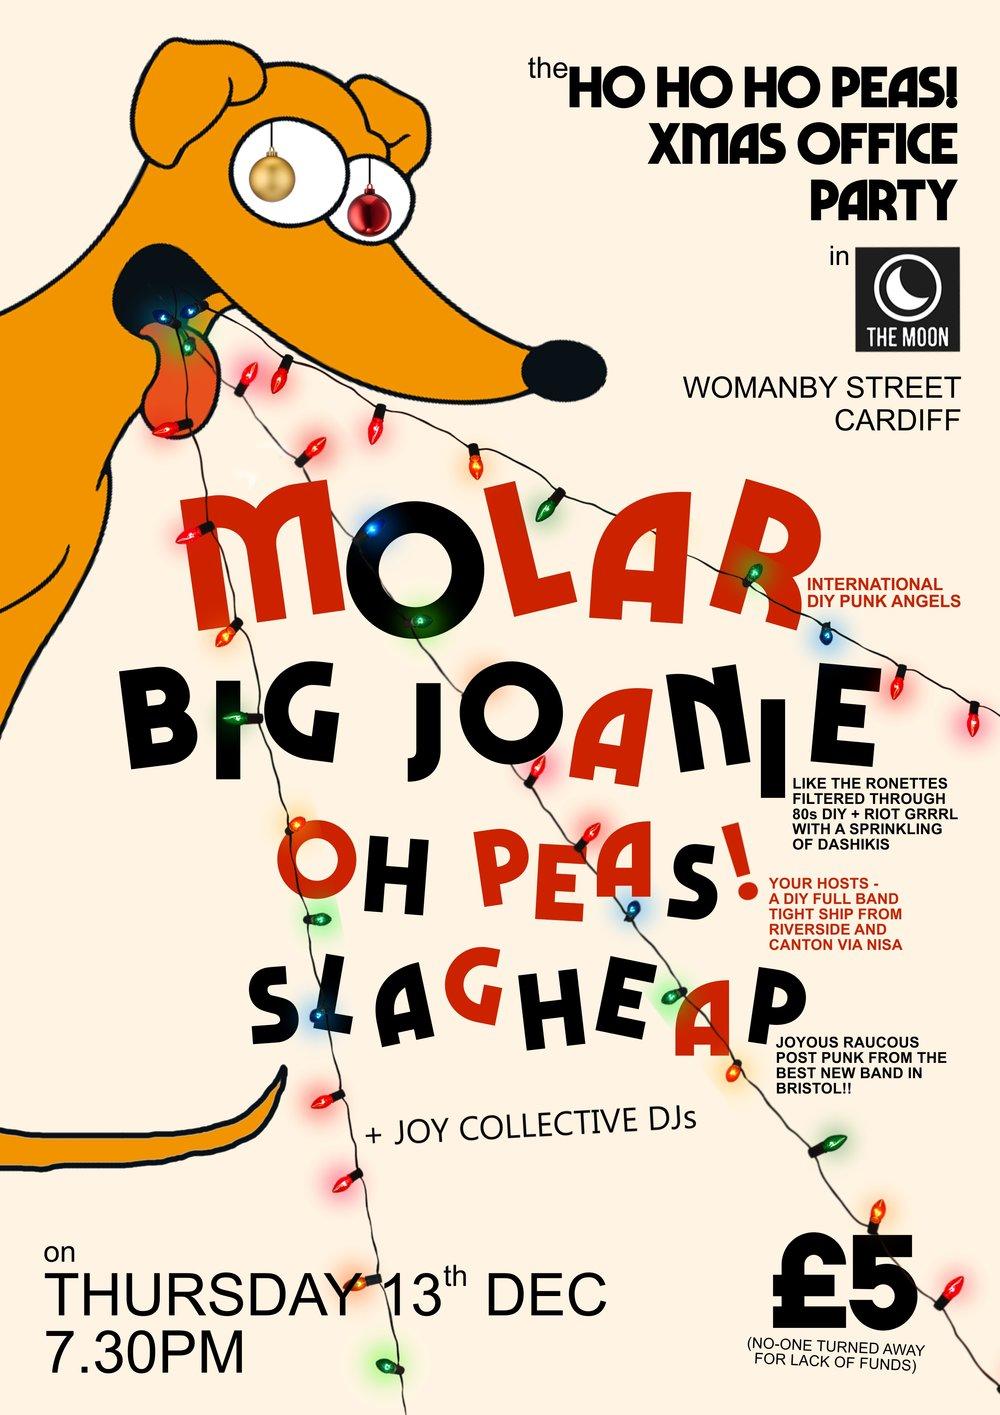 Oh Peas Christmas Party: MOLAR + BIG JOANIE + OH PEAS! + SLAGHEAP ...